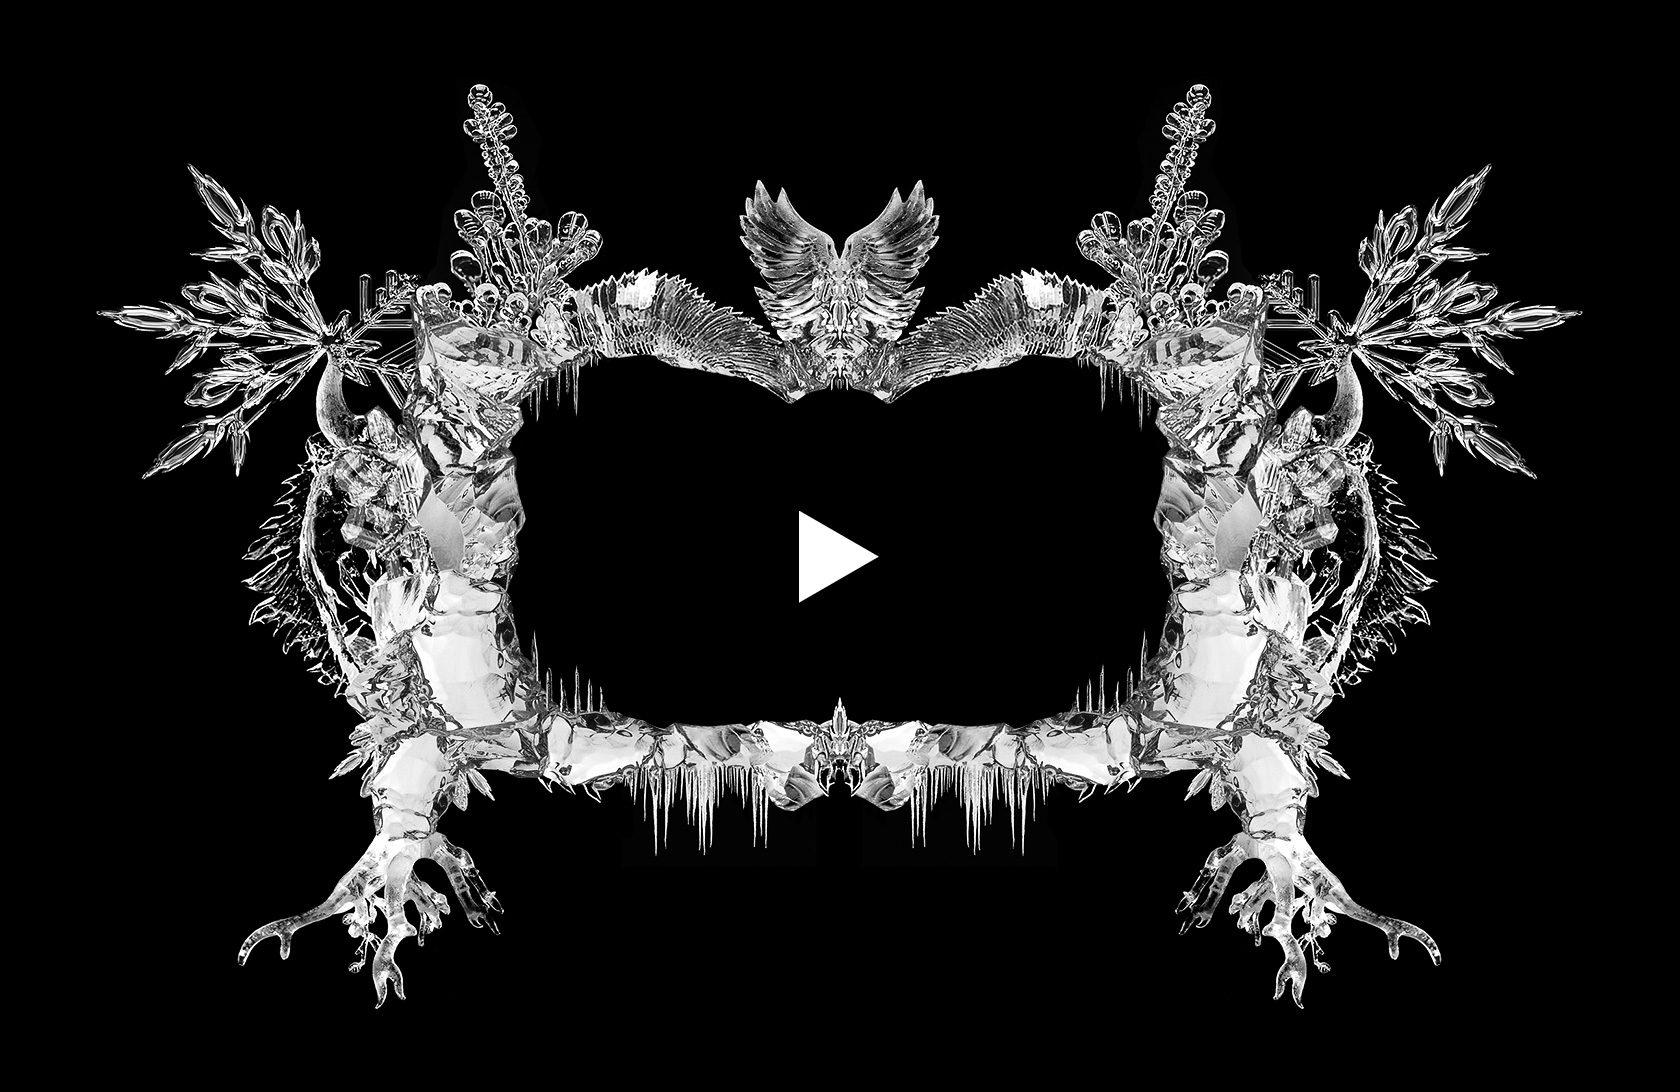 The Visual Medium Media Player Ice Design by Furia